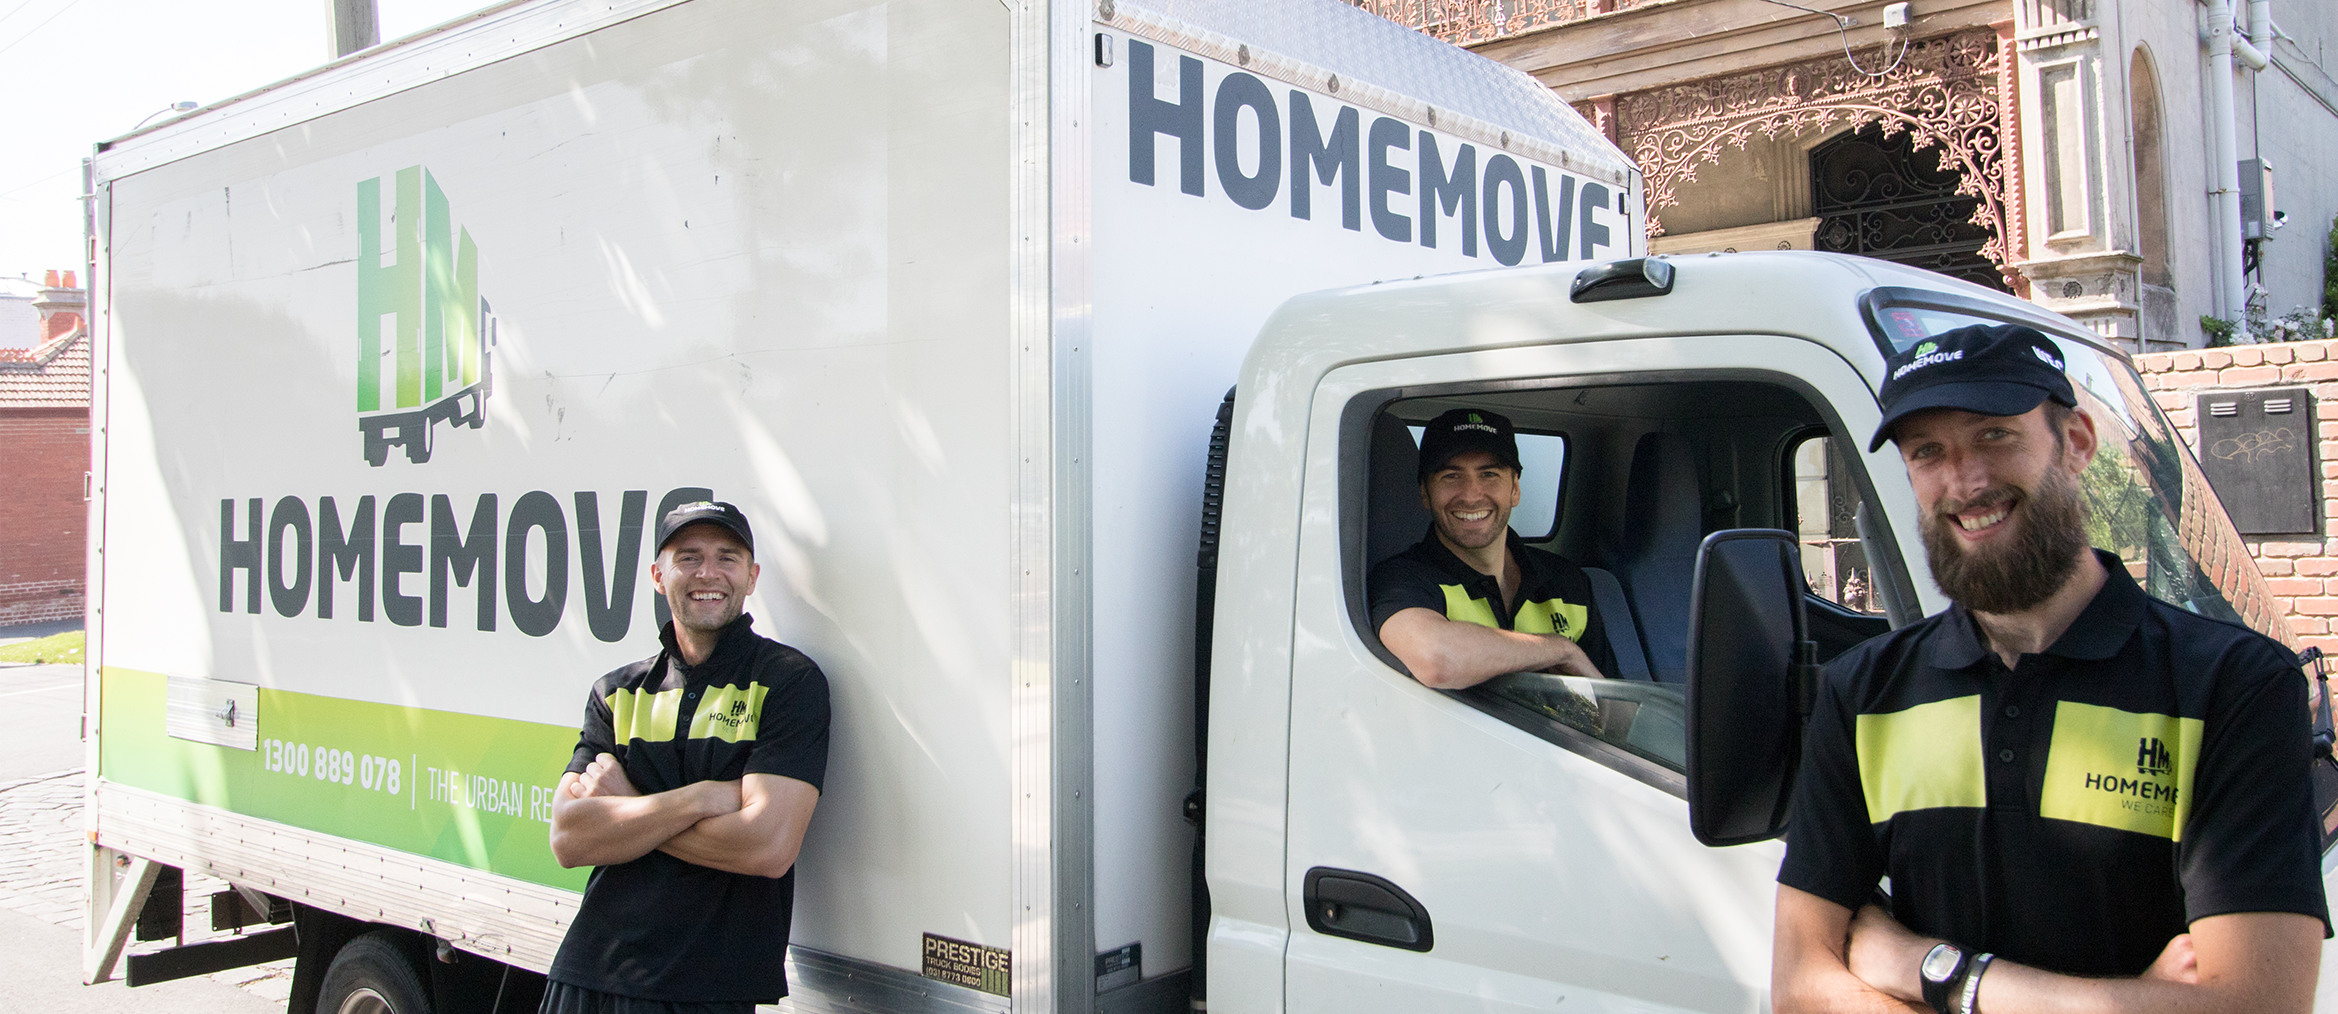 Homemove Removalists Amp Storage Melbourne